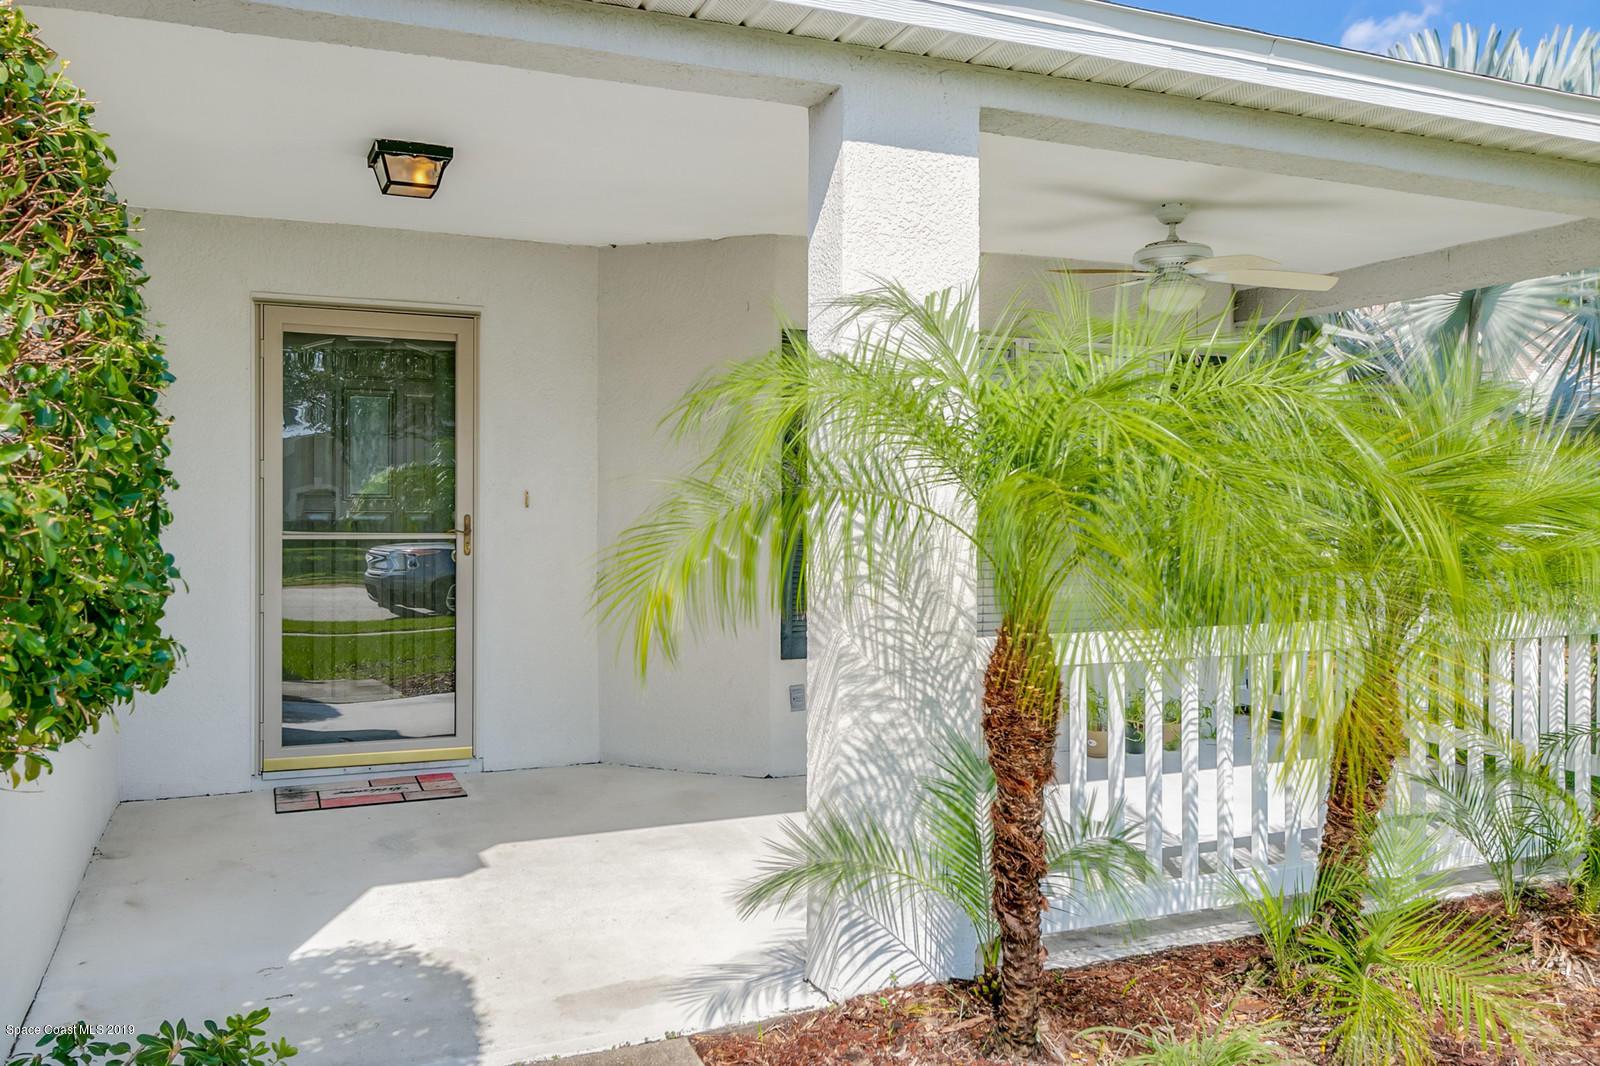 510 Benton Drive, Melbourne, FL | MLS# 845040 | Robby Robertson